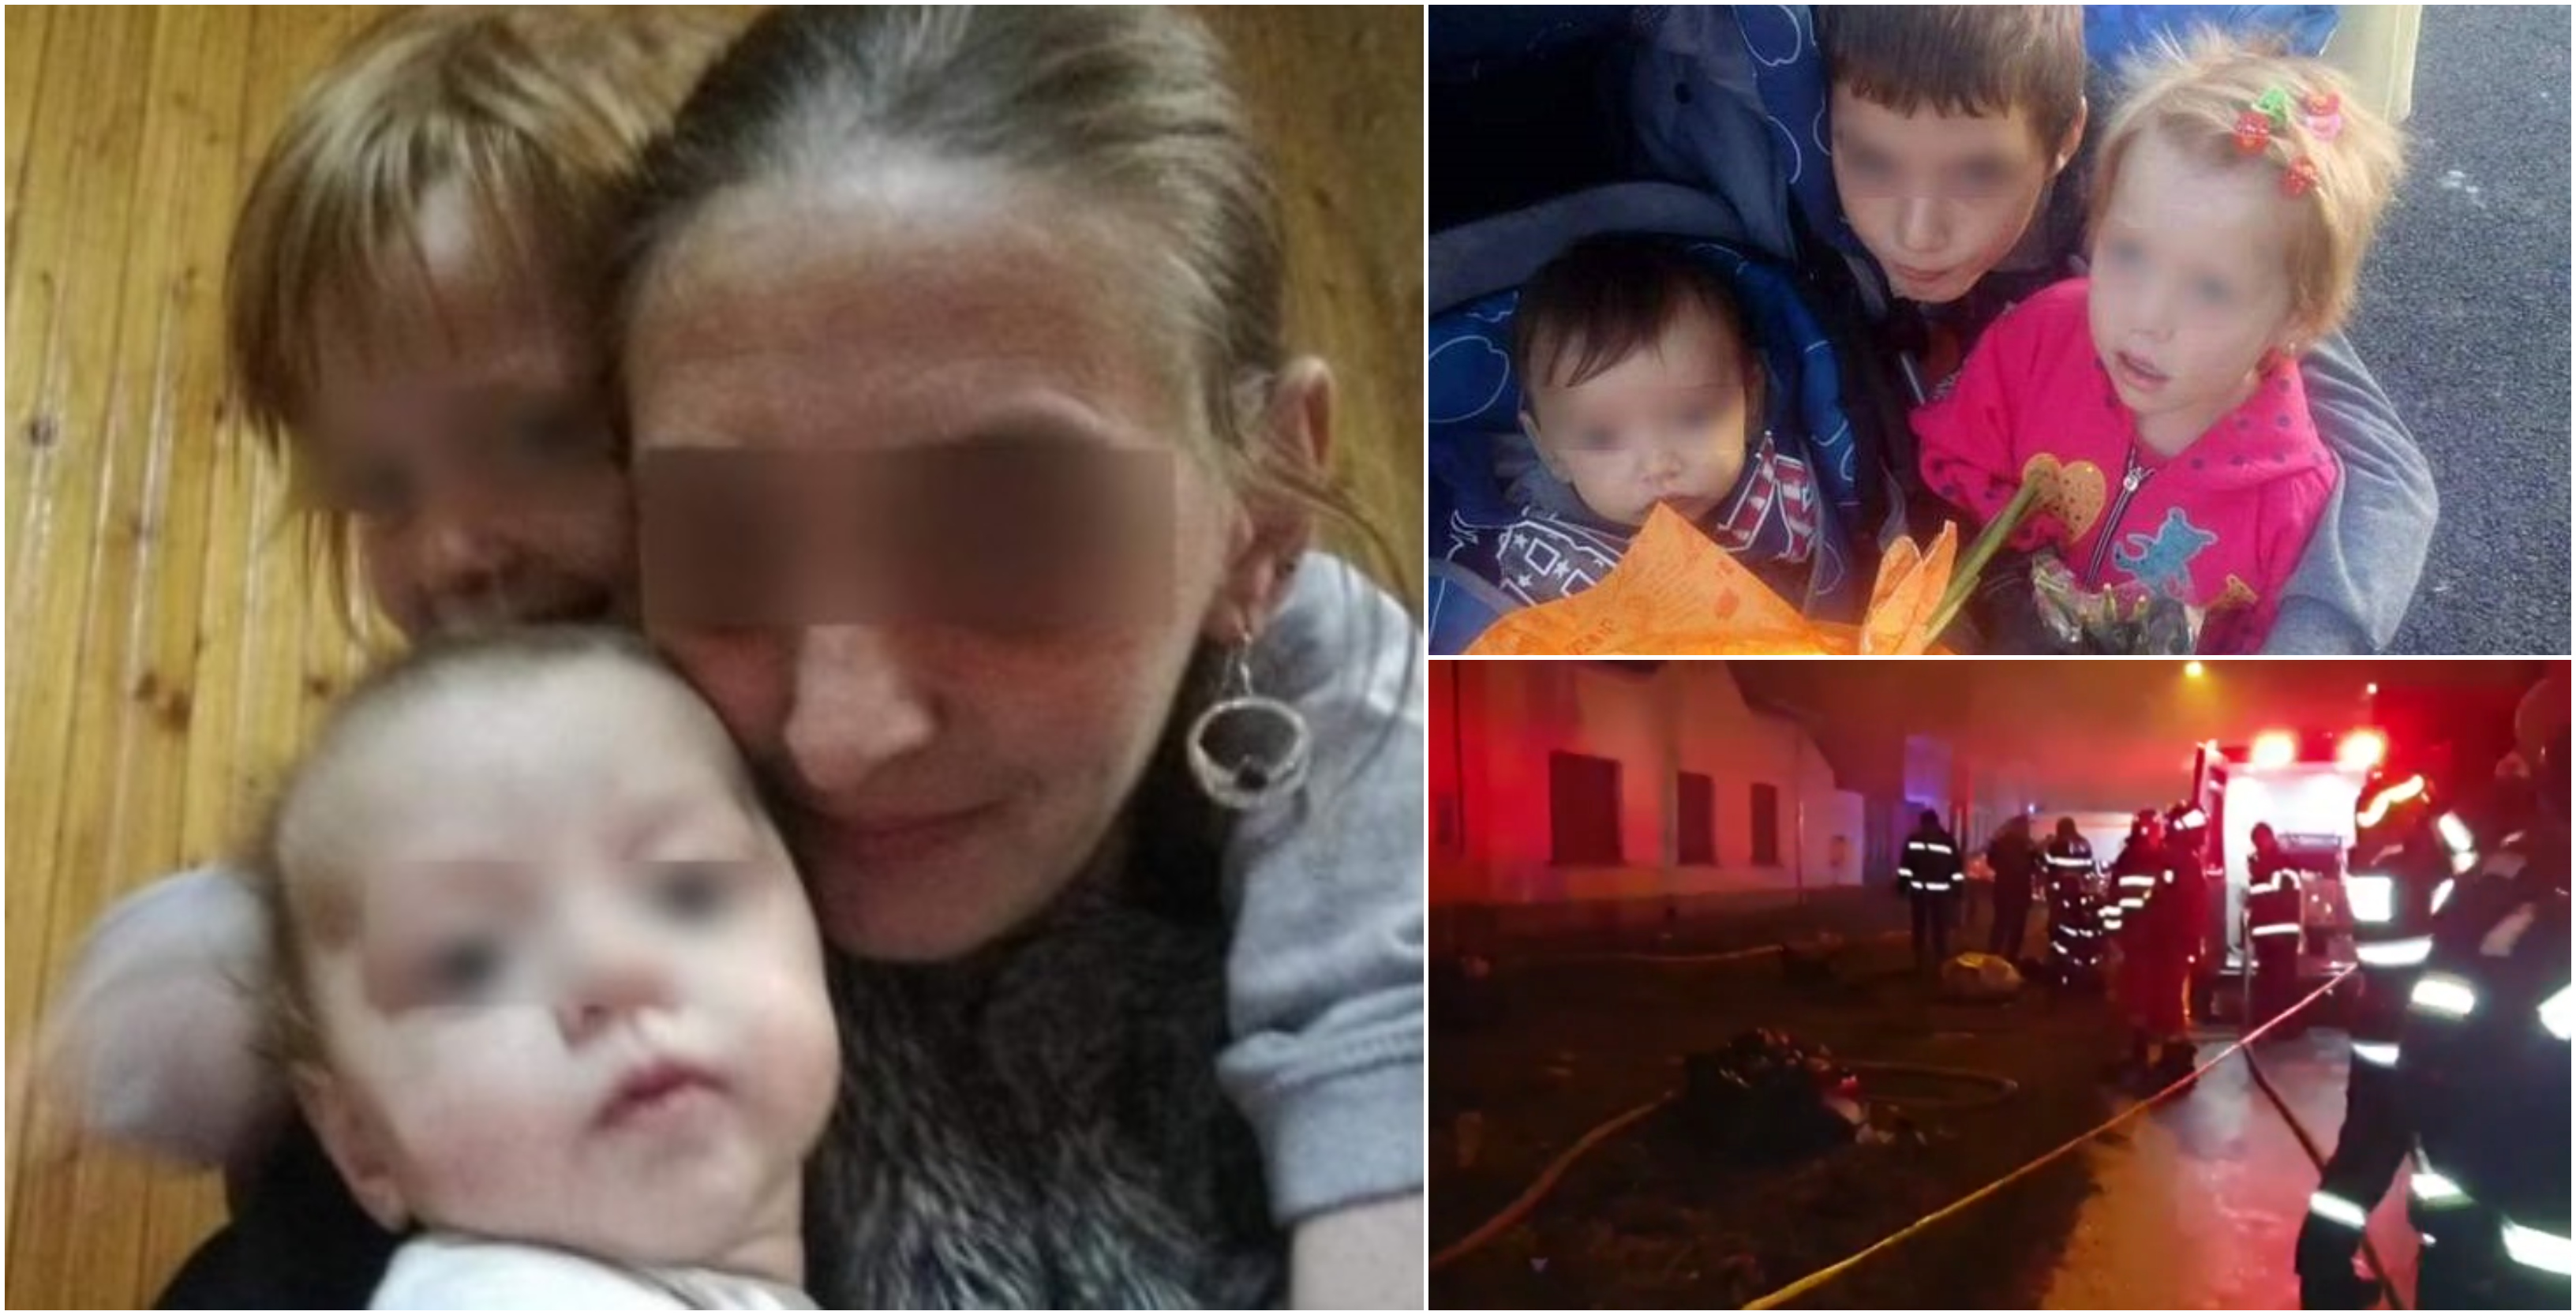 4 frati si-au gasit sfarsitul in locuinta cuprinsa de flacari. Parintii i-au lasat in grija fratelui mai mare VIDEO | Demamici.ro